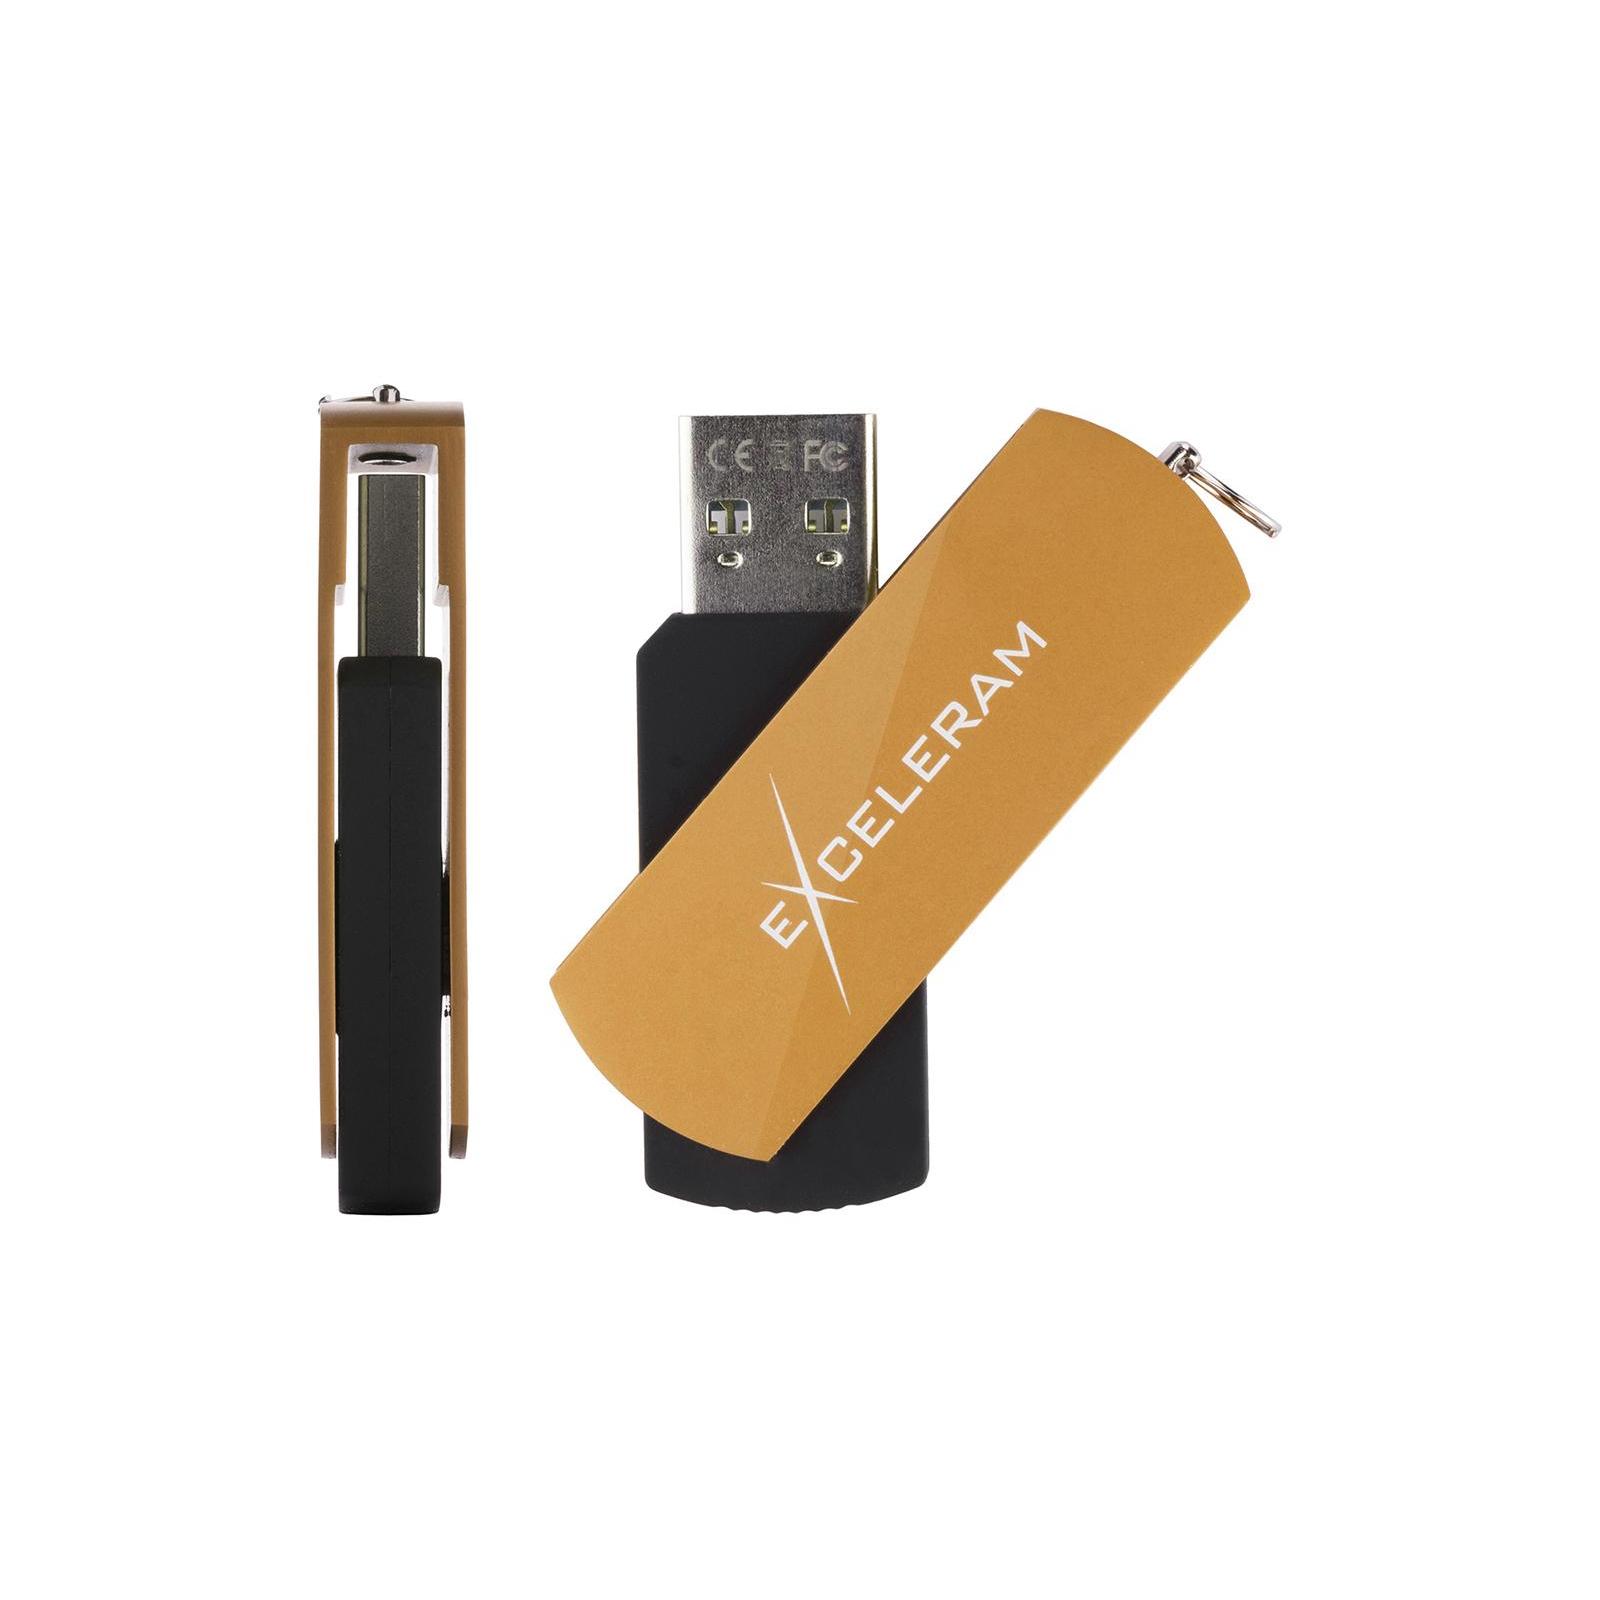 USB флеш накопитель eXceleram 8GB P2 Series Rose/Black USB 2.0 (EXP2U2ROB08) изображение 4